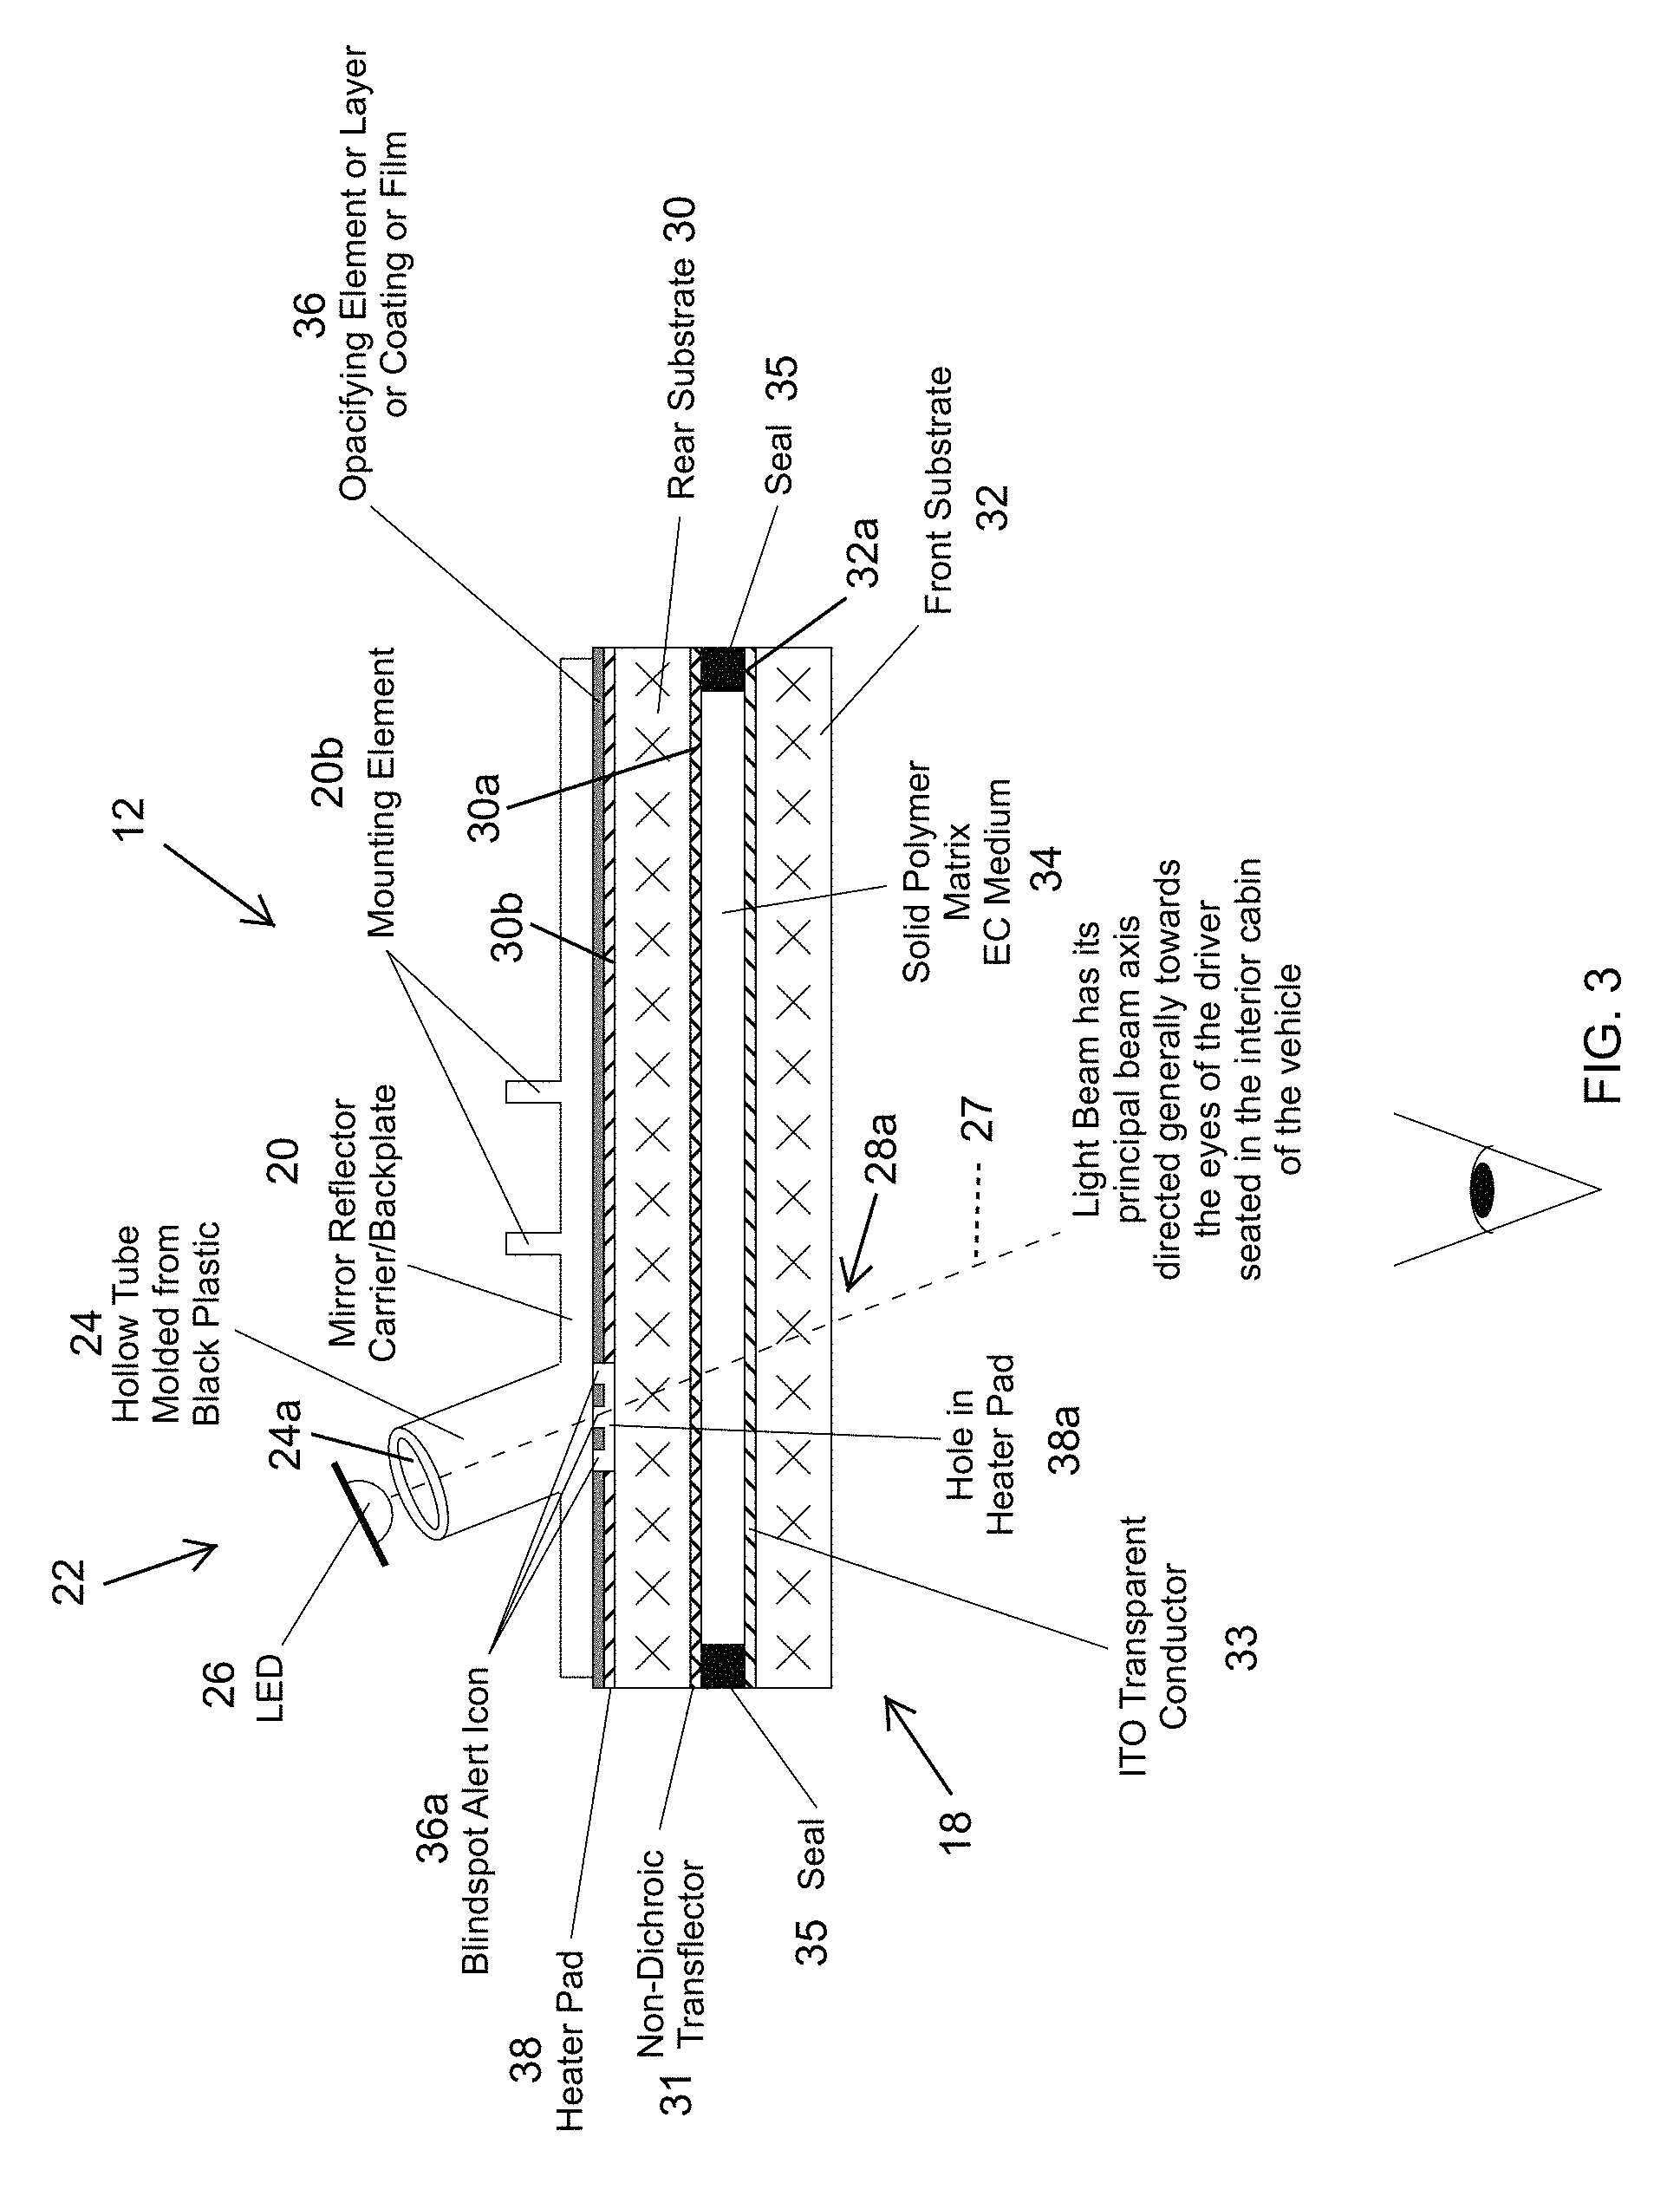 Patent US 9,758,102 B1 on